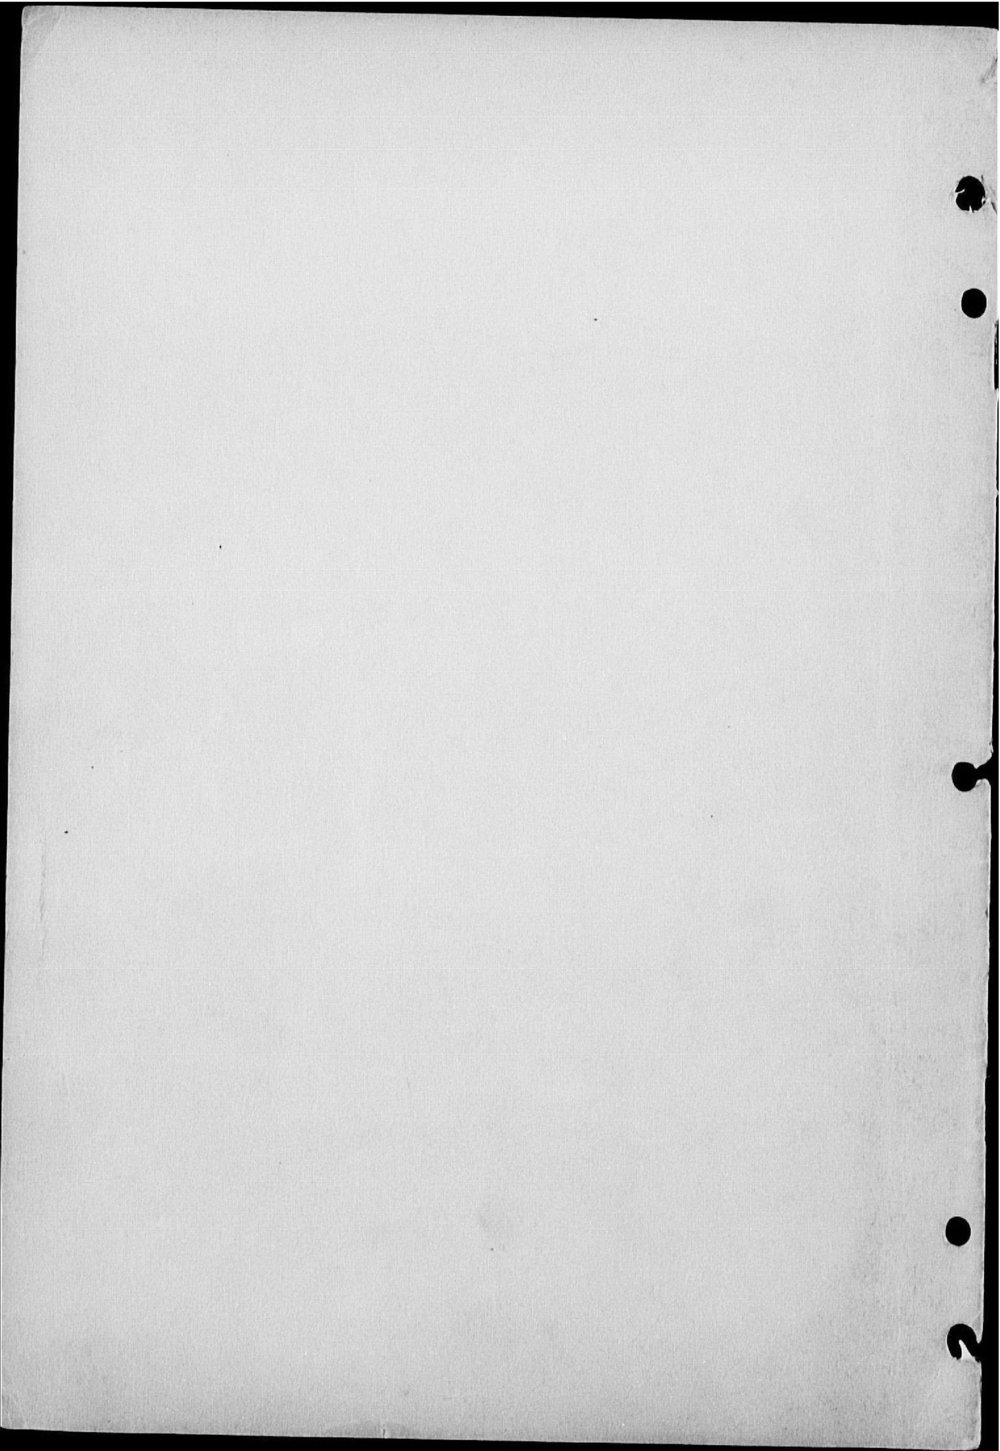 The Kansas Star, volume LVII, number 1 - Back